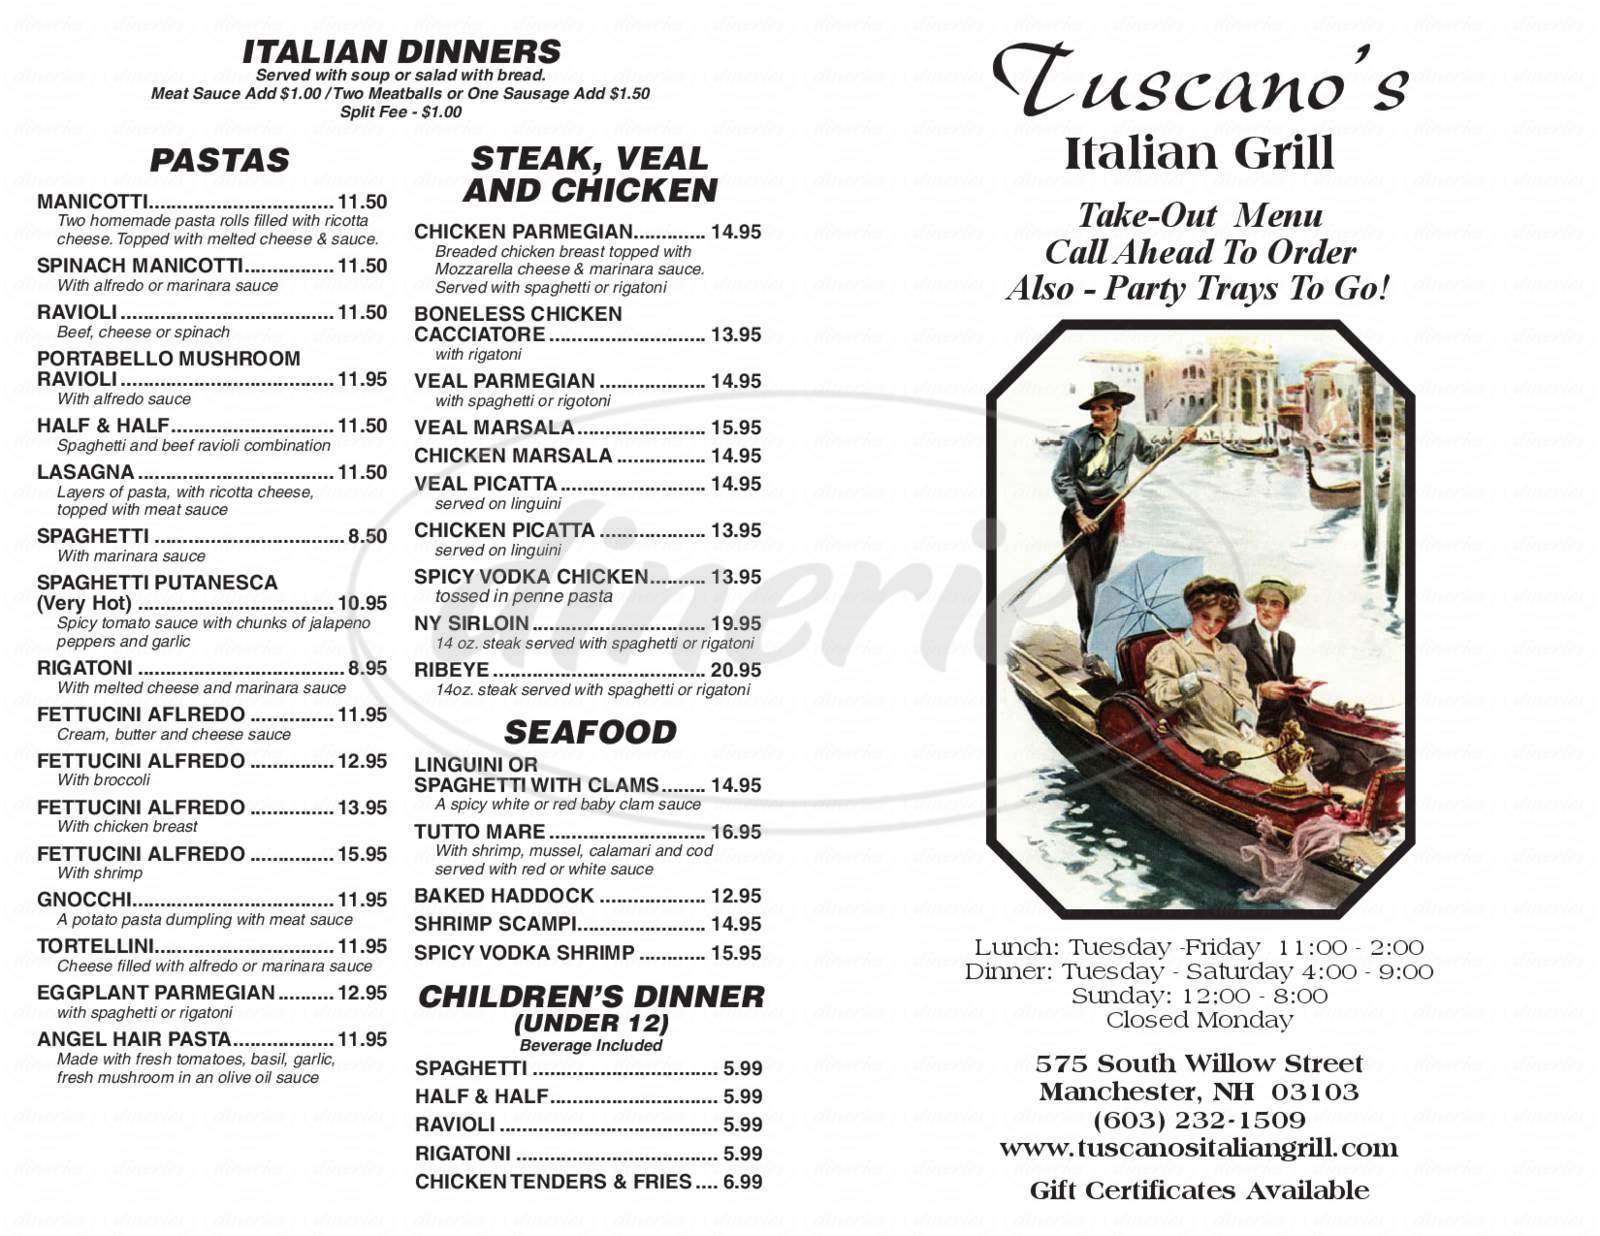 menu for Tuscano's Italian Grill